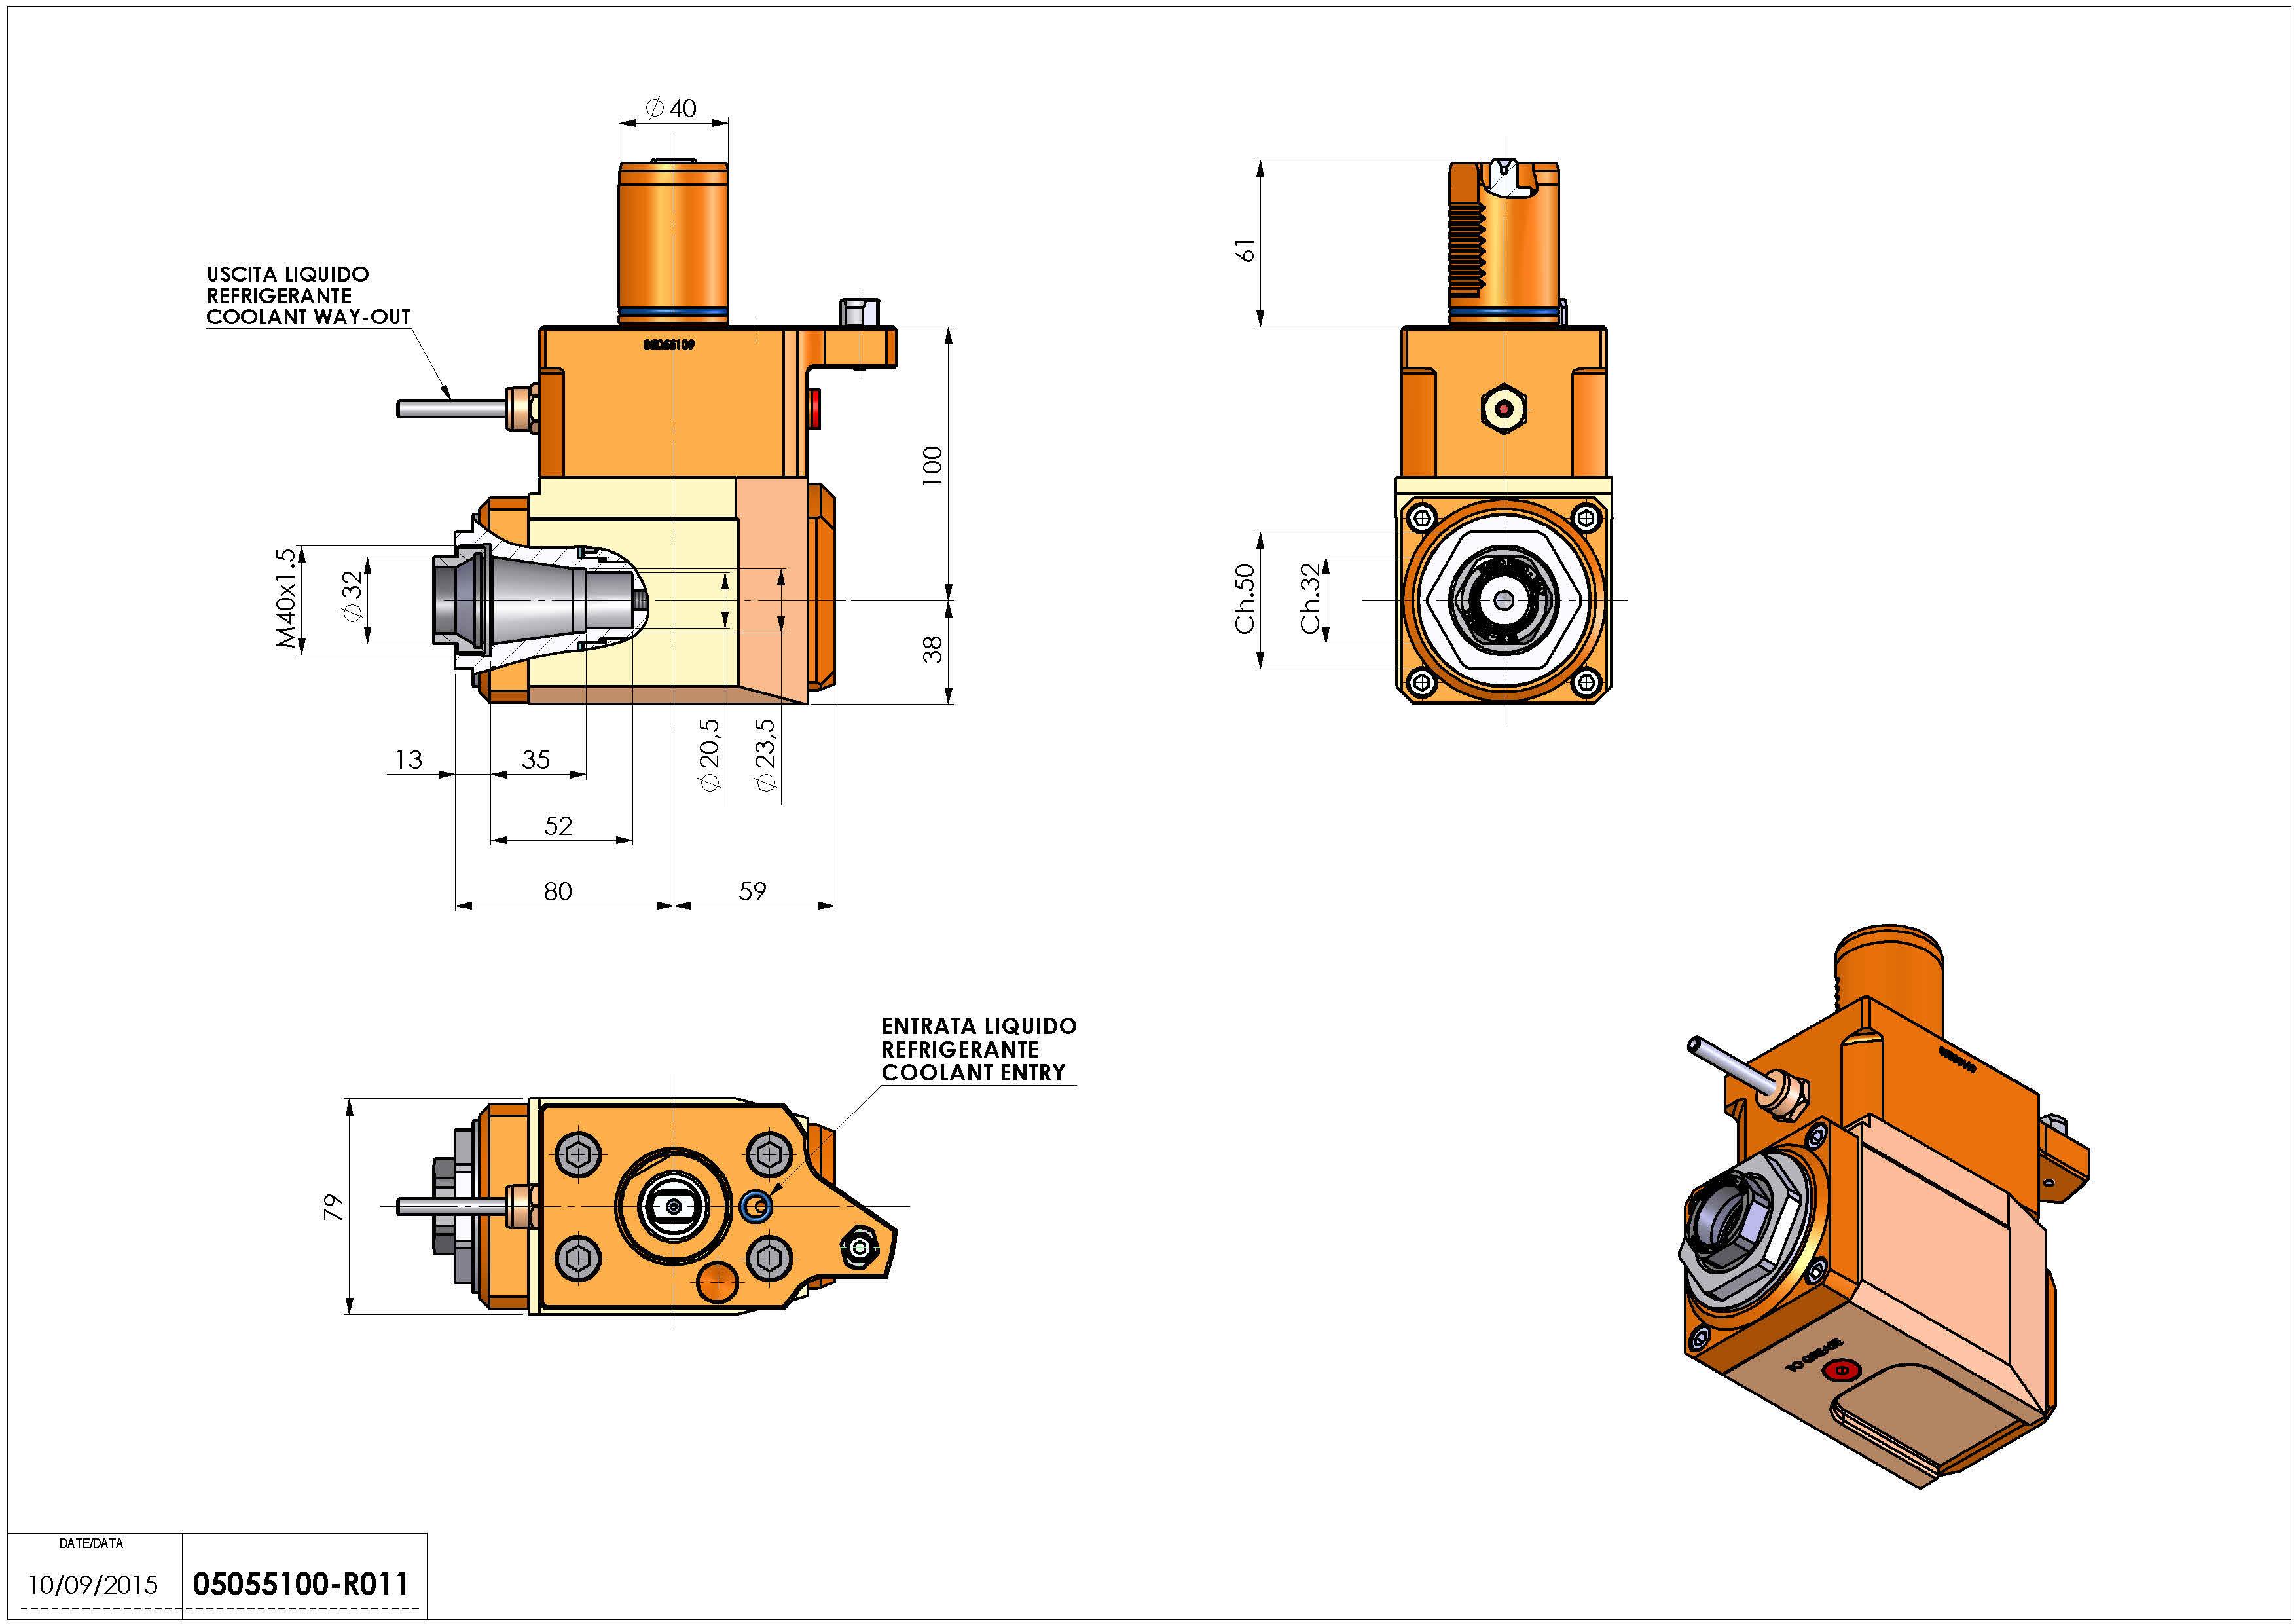 Technical image - LT-A VDI40 ER32F G60 L H100 MZ.